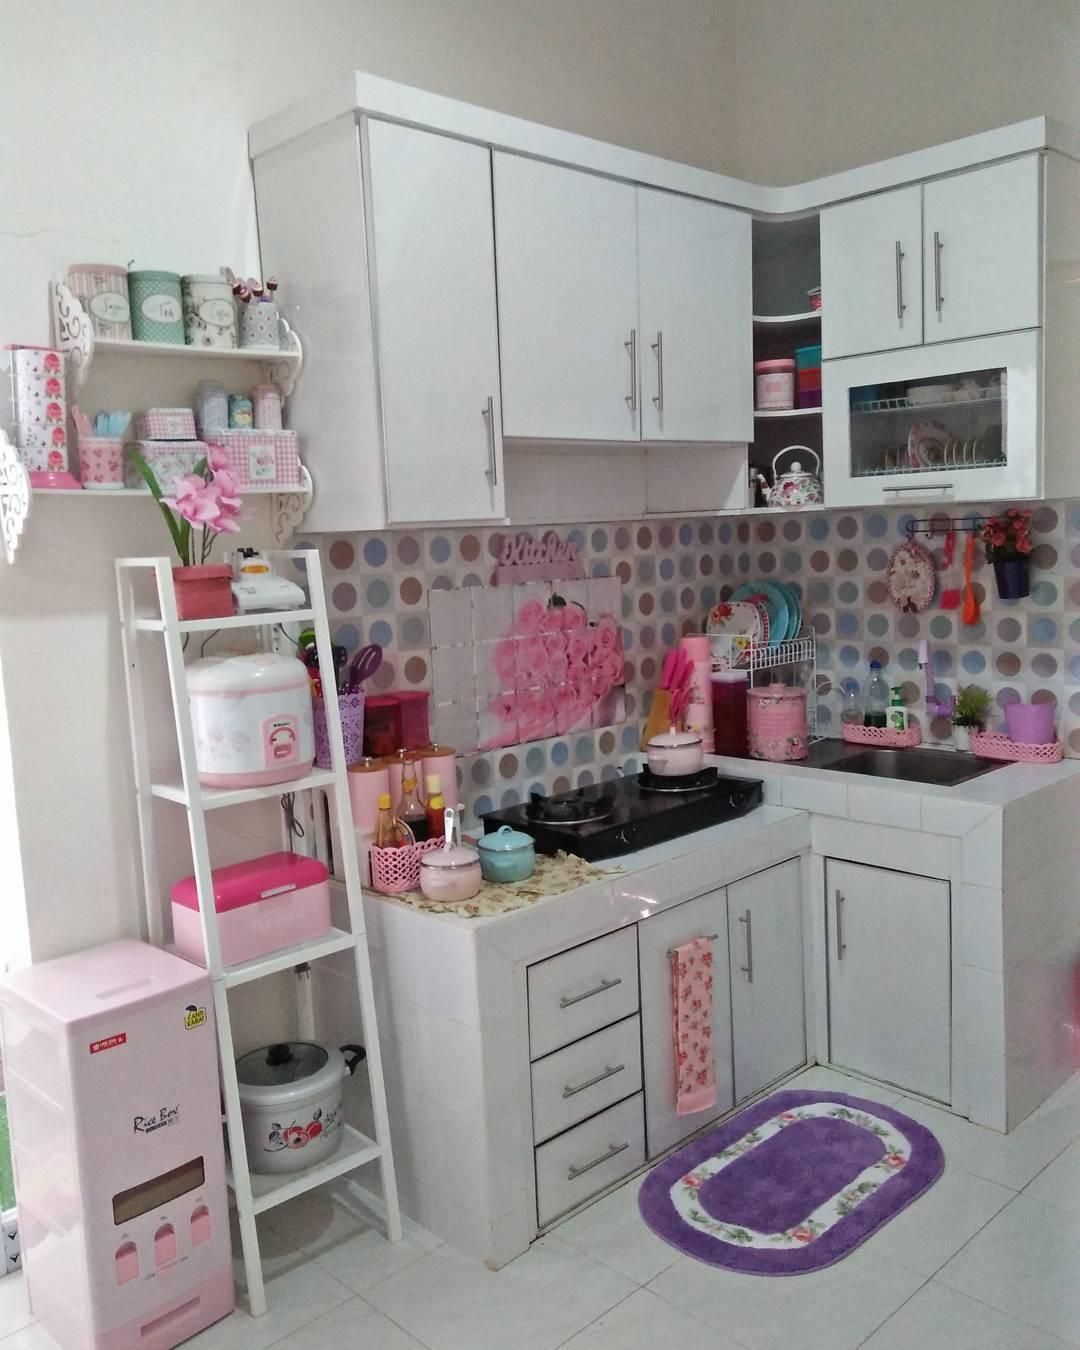 Ukuran Ideal Sebuah Dapur Rumah Shabby Chic Minimalis Hello